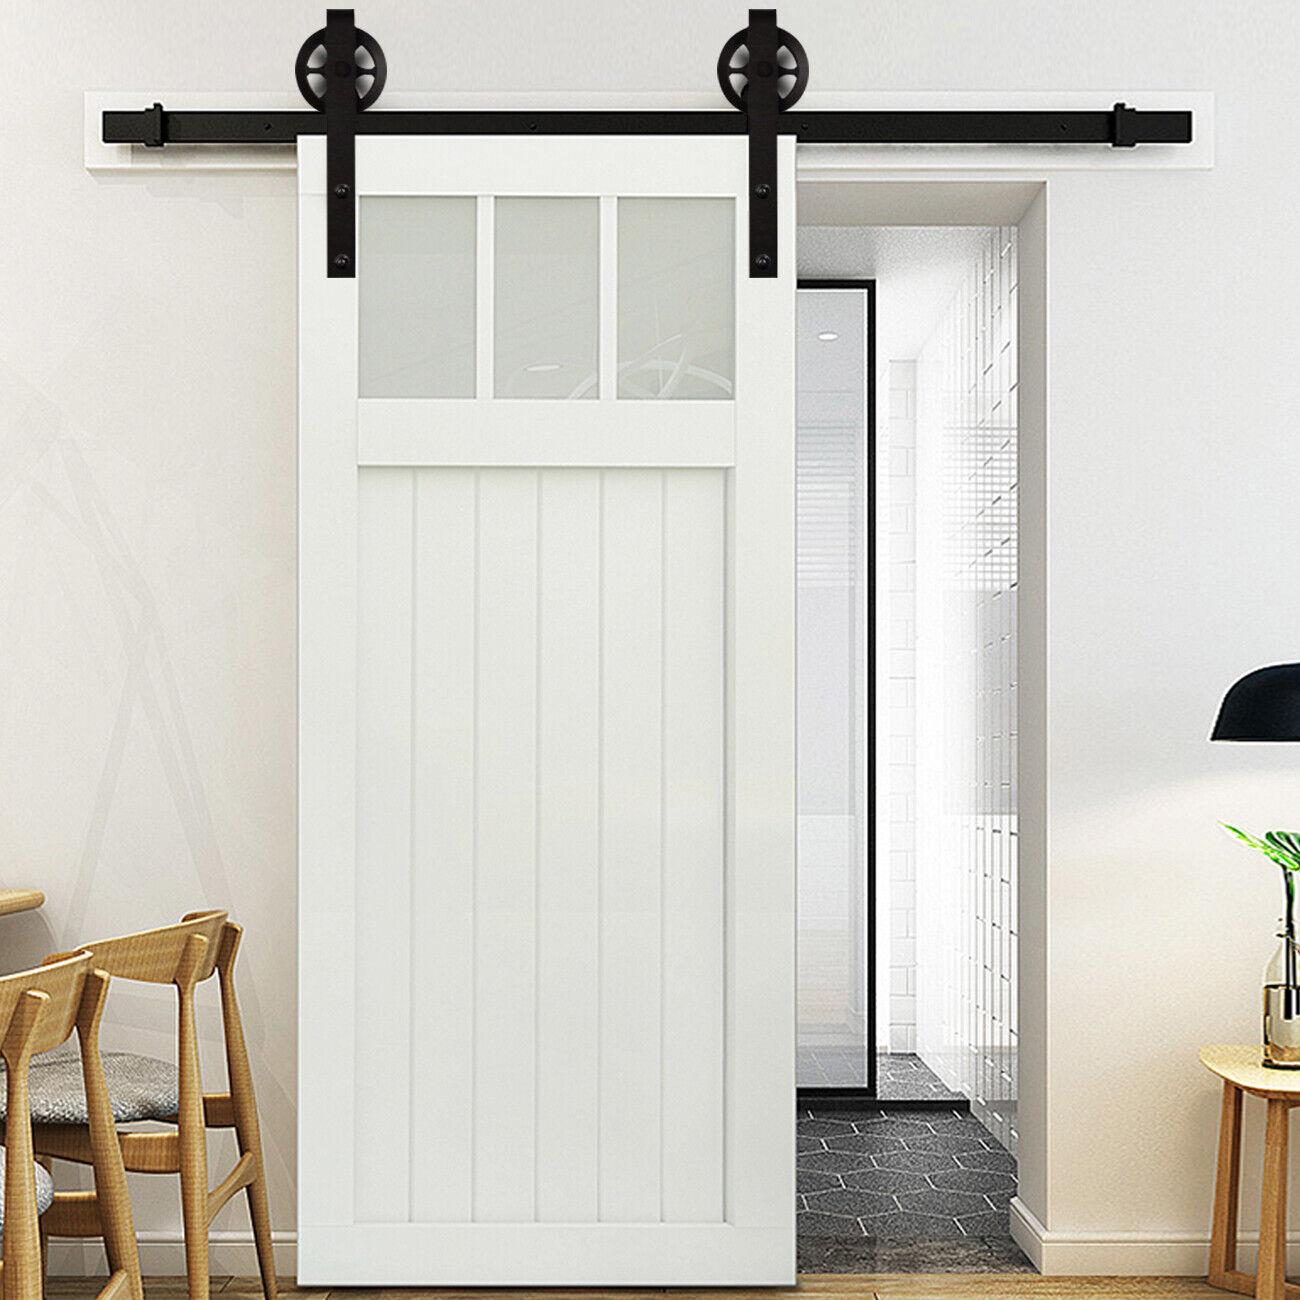 Black Anton Sliding Barn Door Gentlemans Chest Armoire Solid Wood Quality For Sale Online Ebay